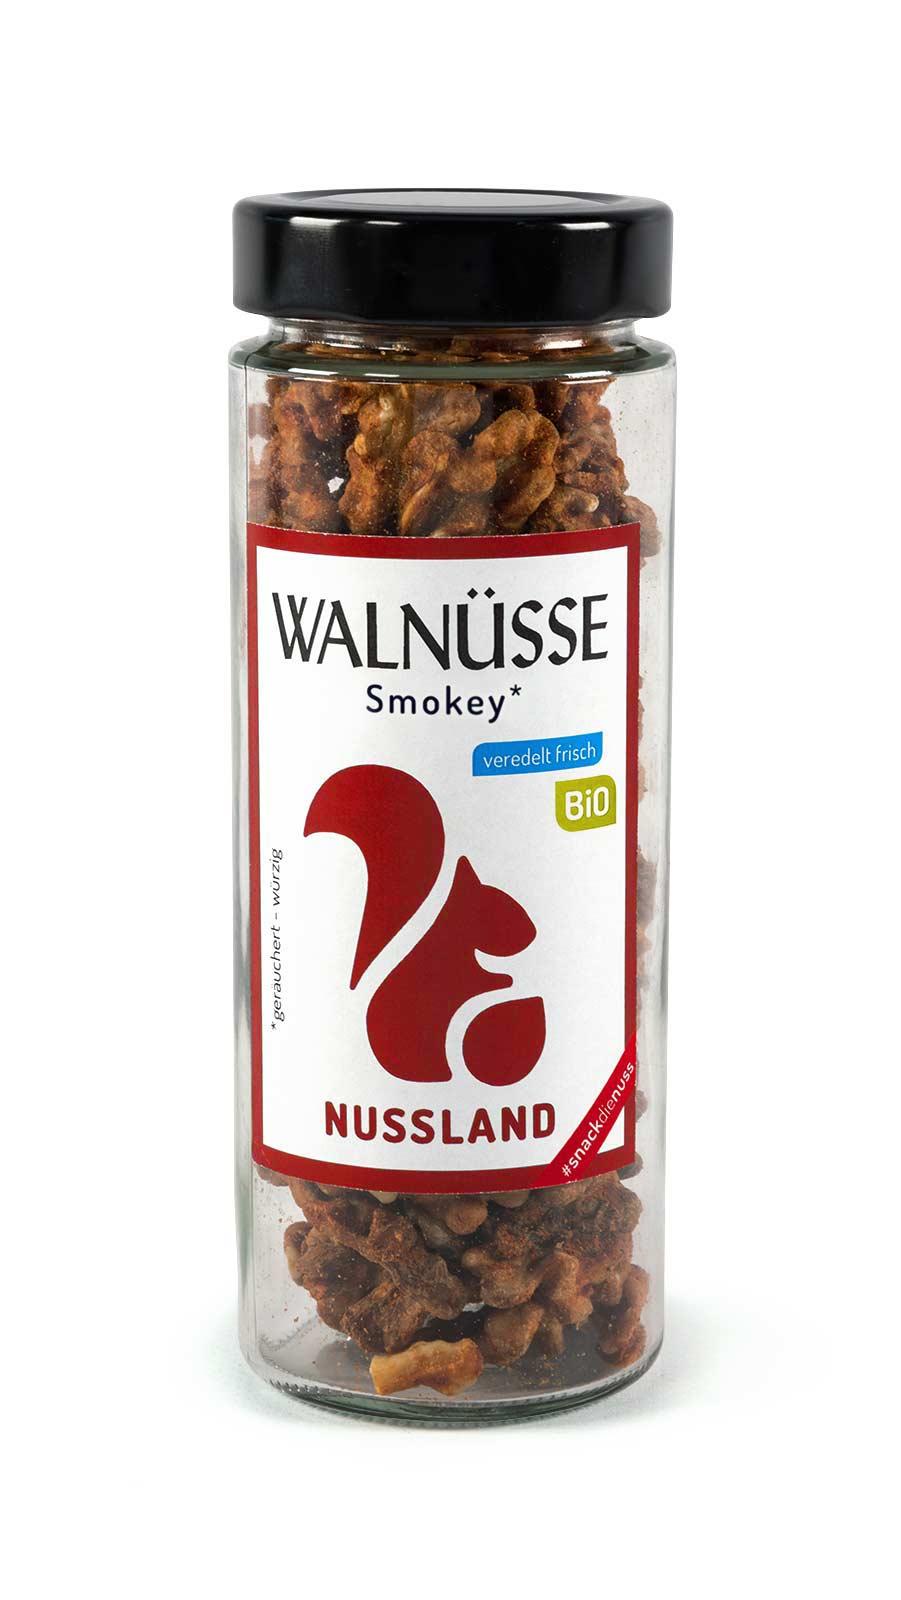 BIO Walnuss-Snack 'Smokey'